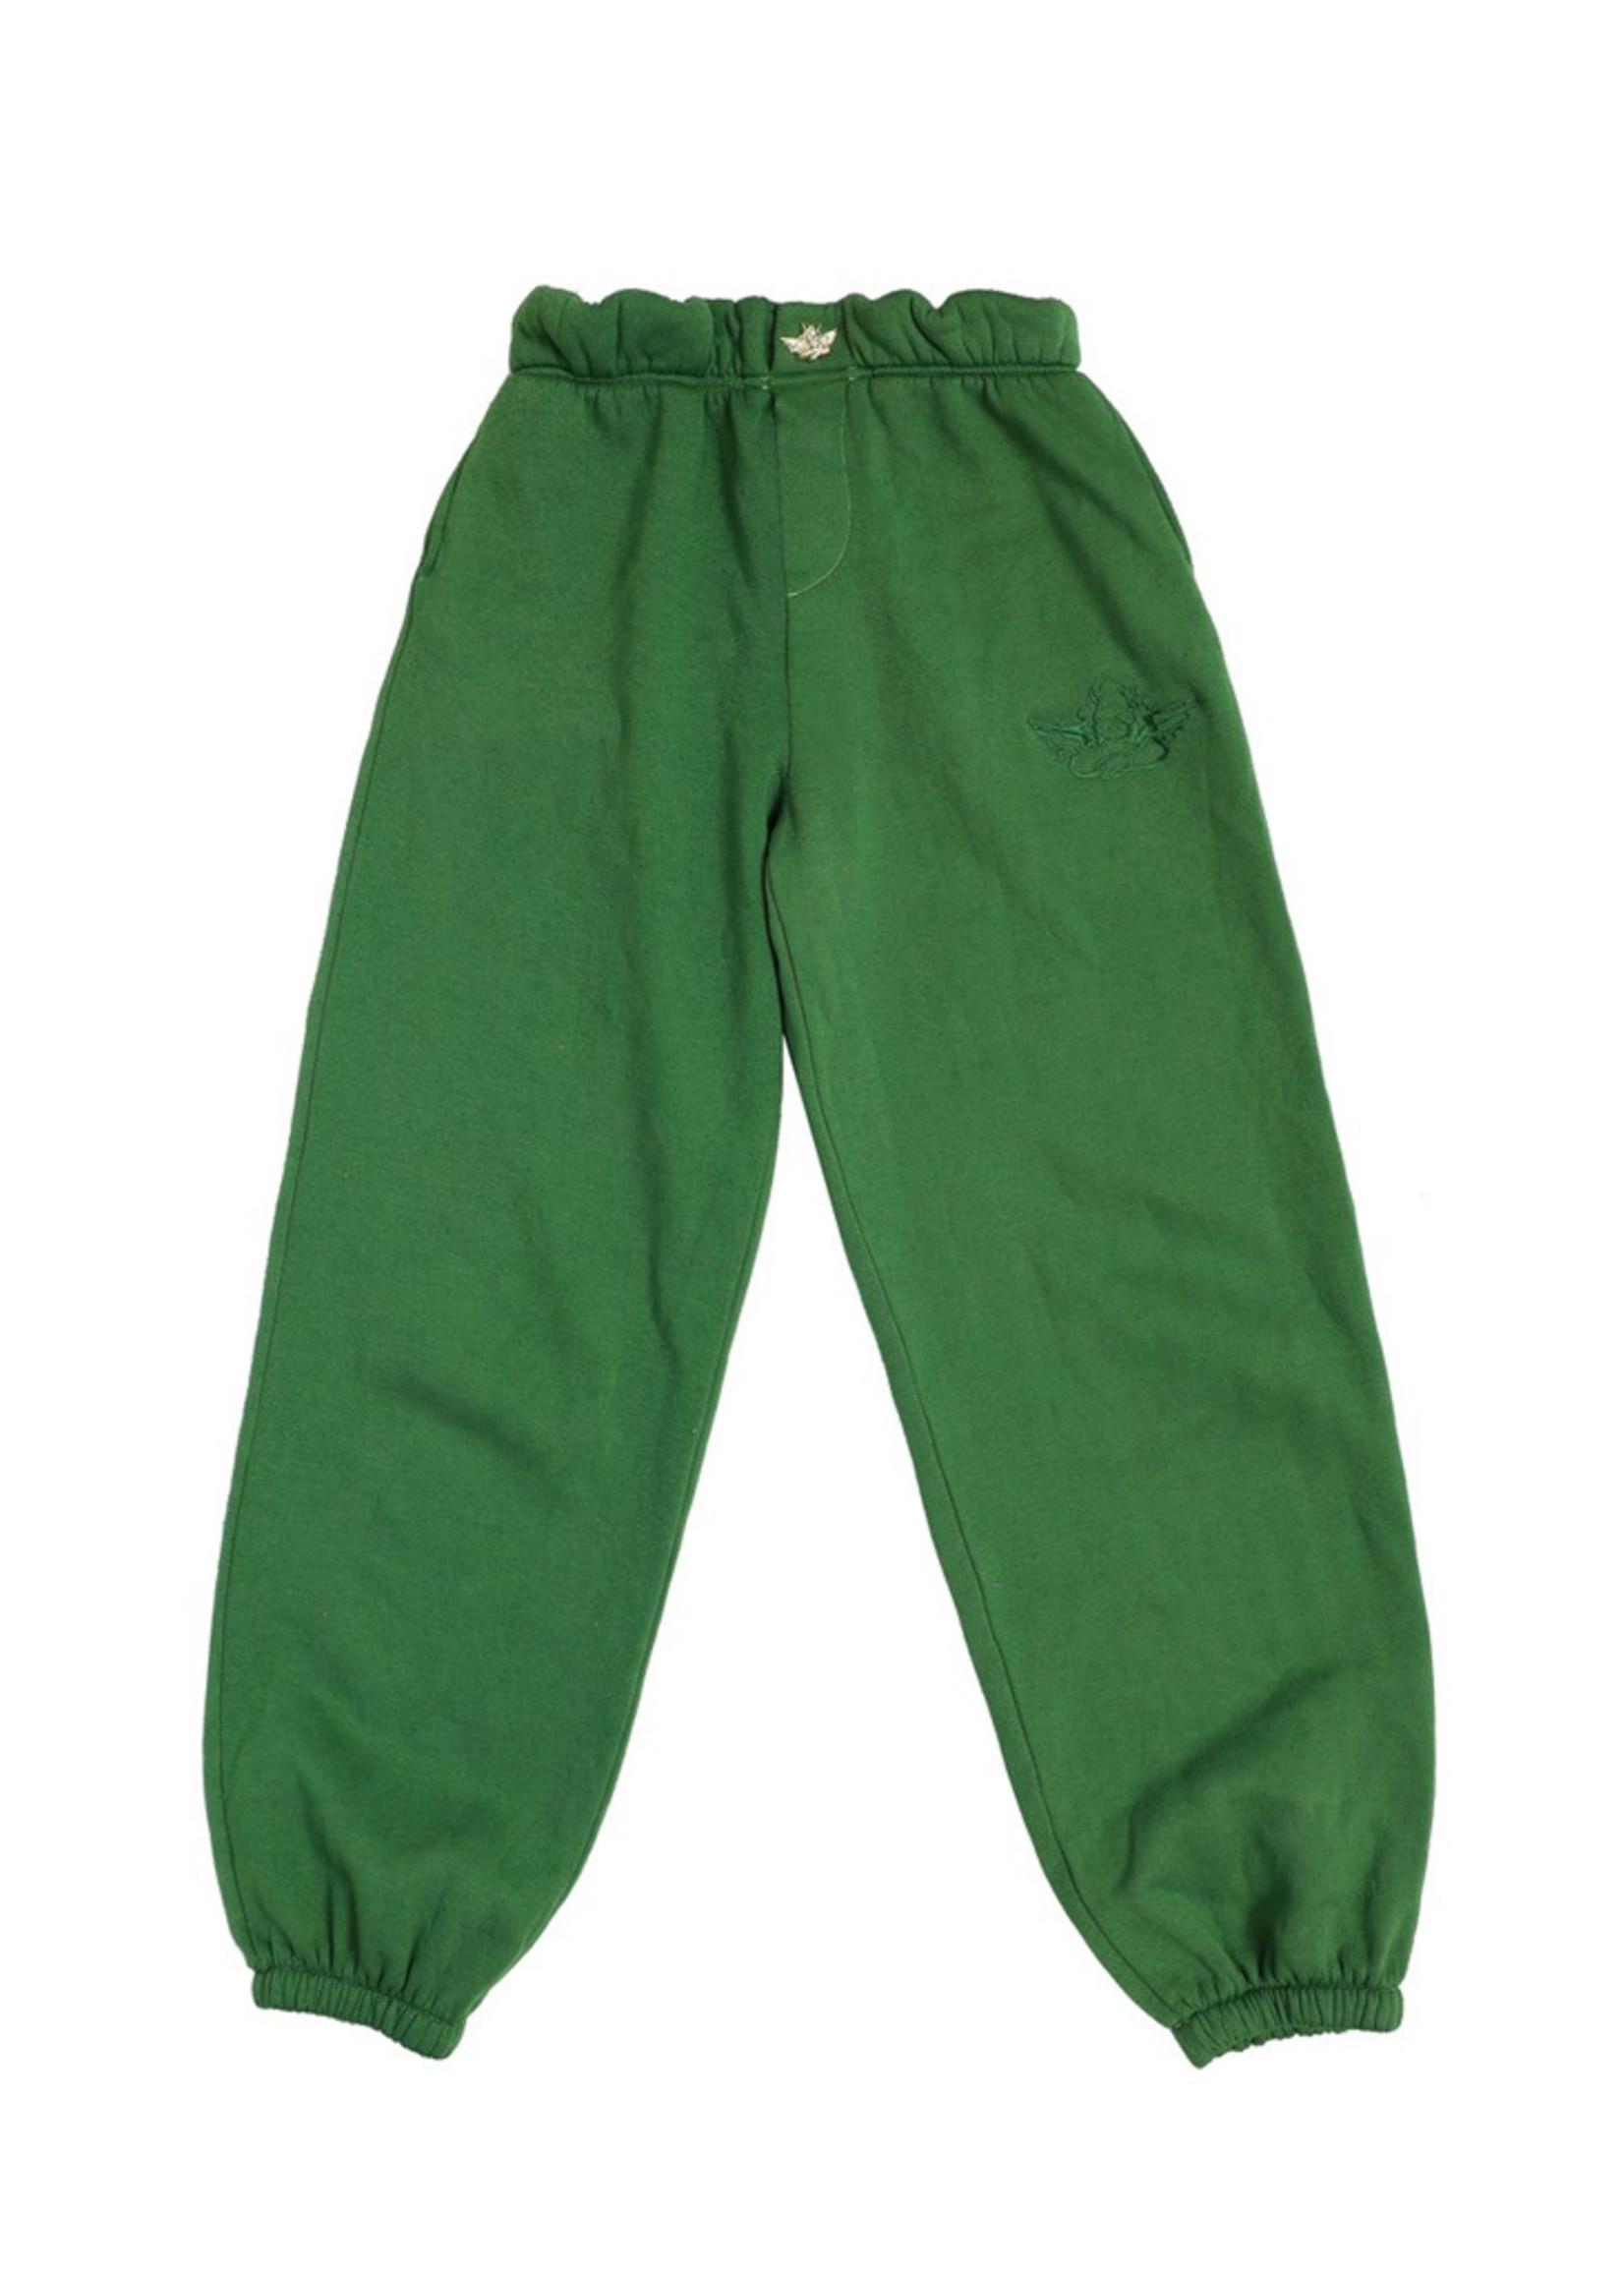 BOYS LIE BOYS LIE / Army Green Josh Grunfeld Pant